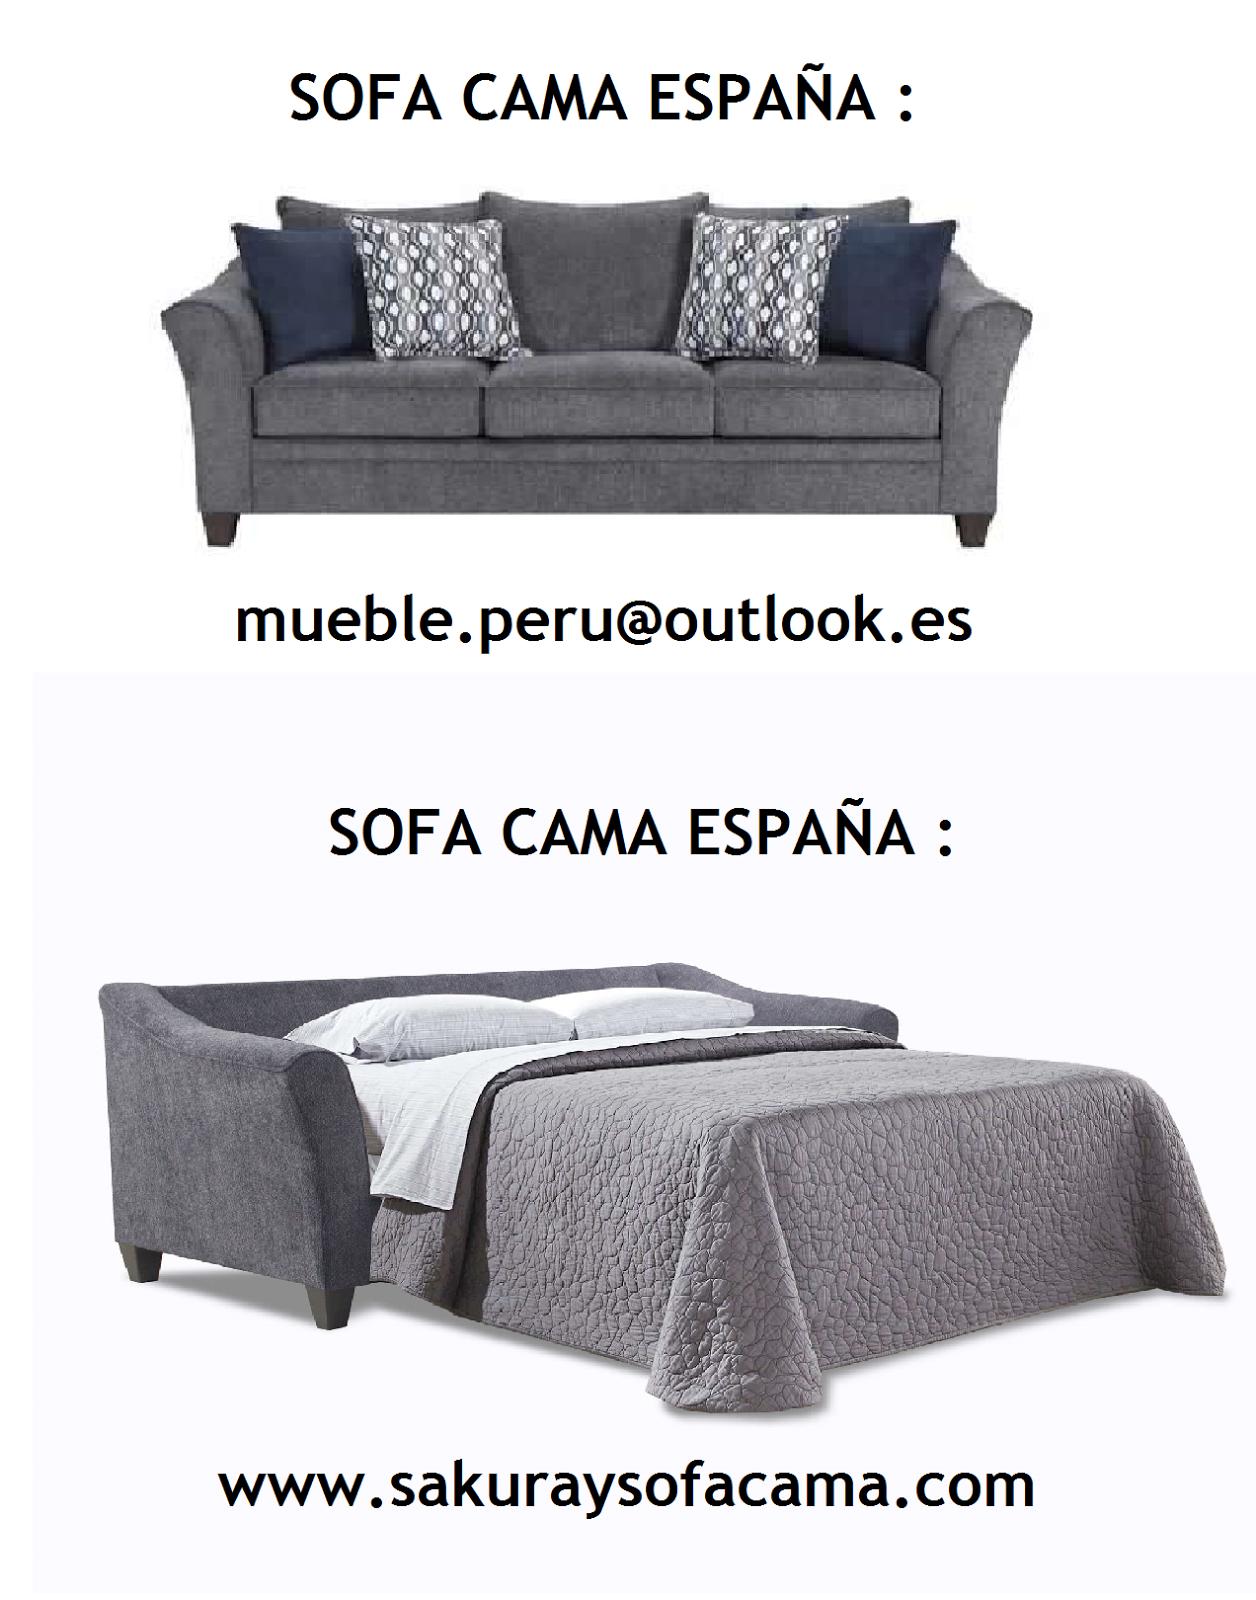 Mueble peru sakuray sofa cama espa a - Mueble sofa cama ...